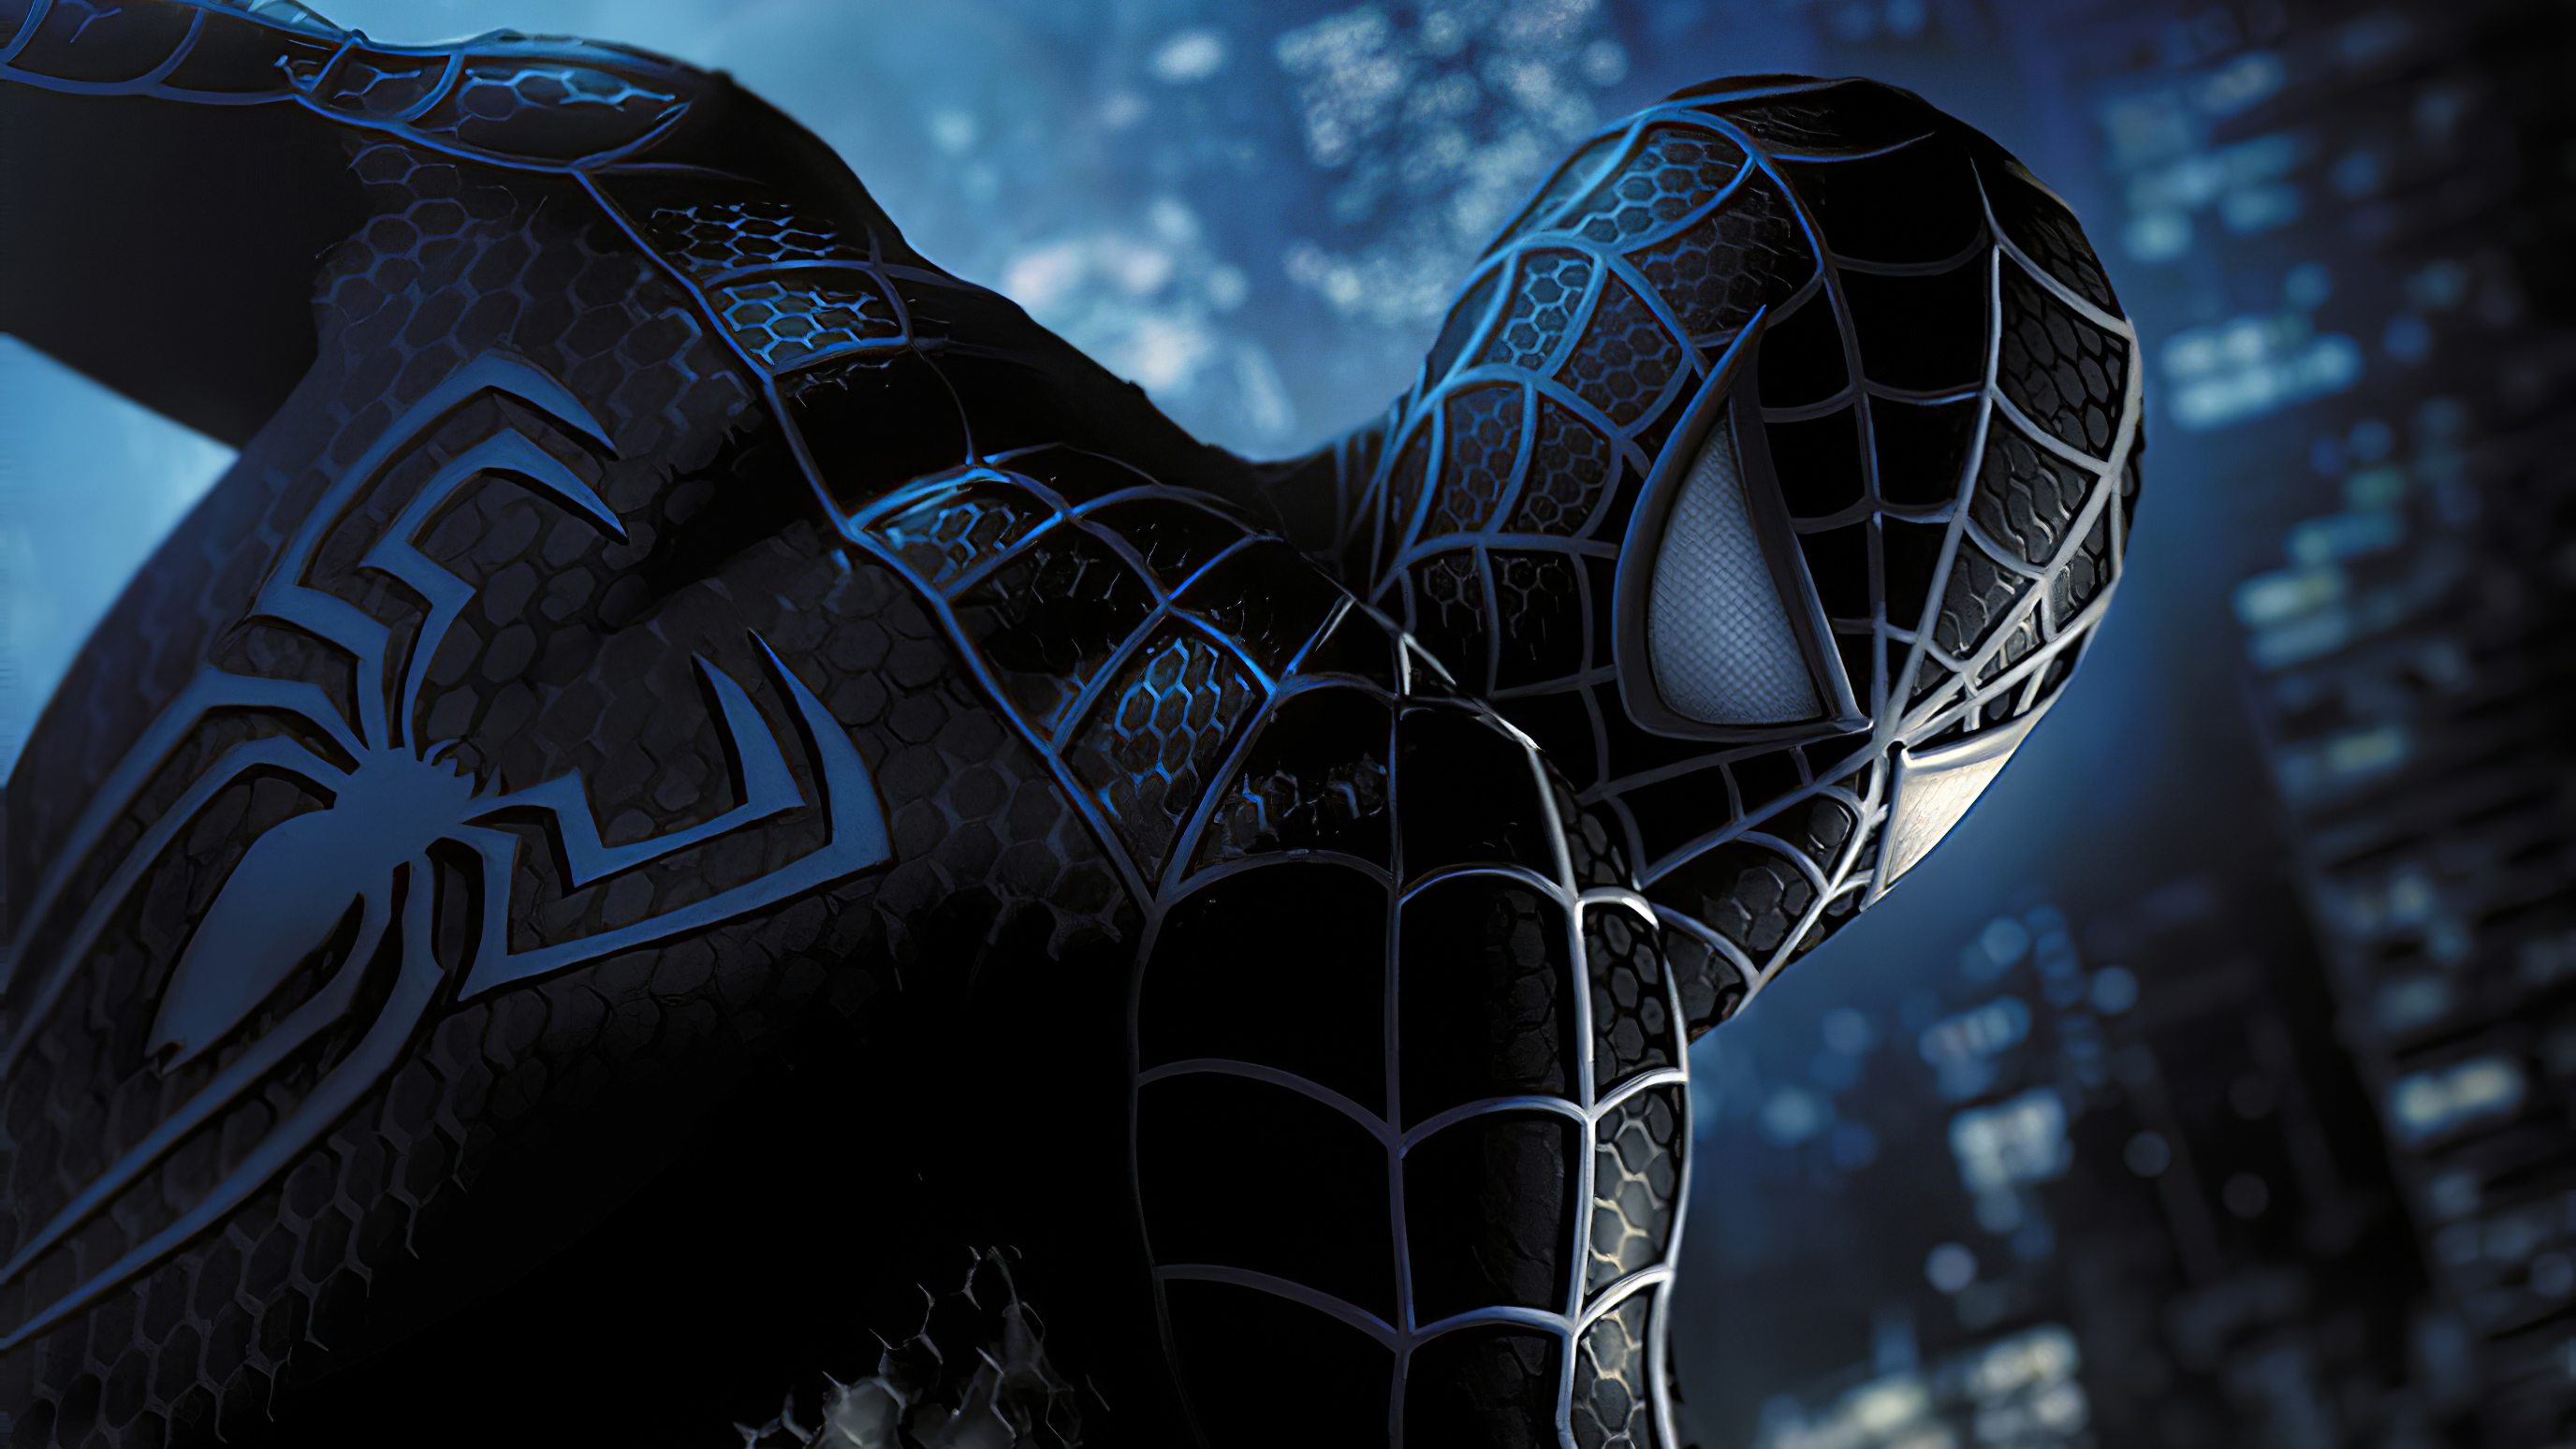 Wallpaper Black Spiderman